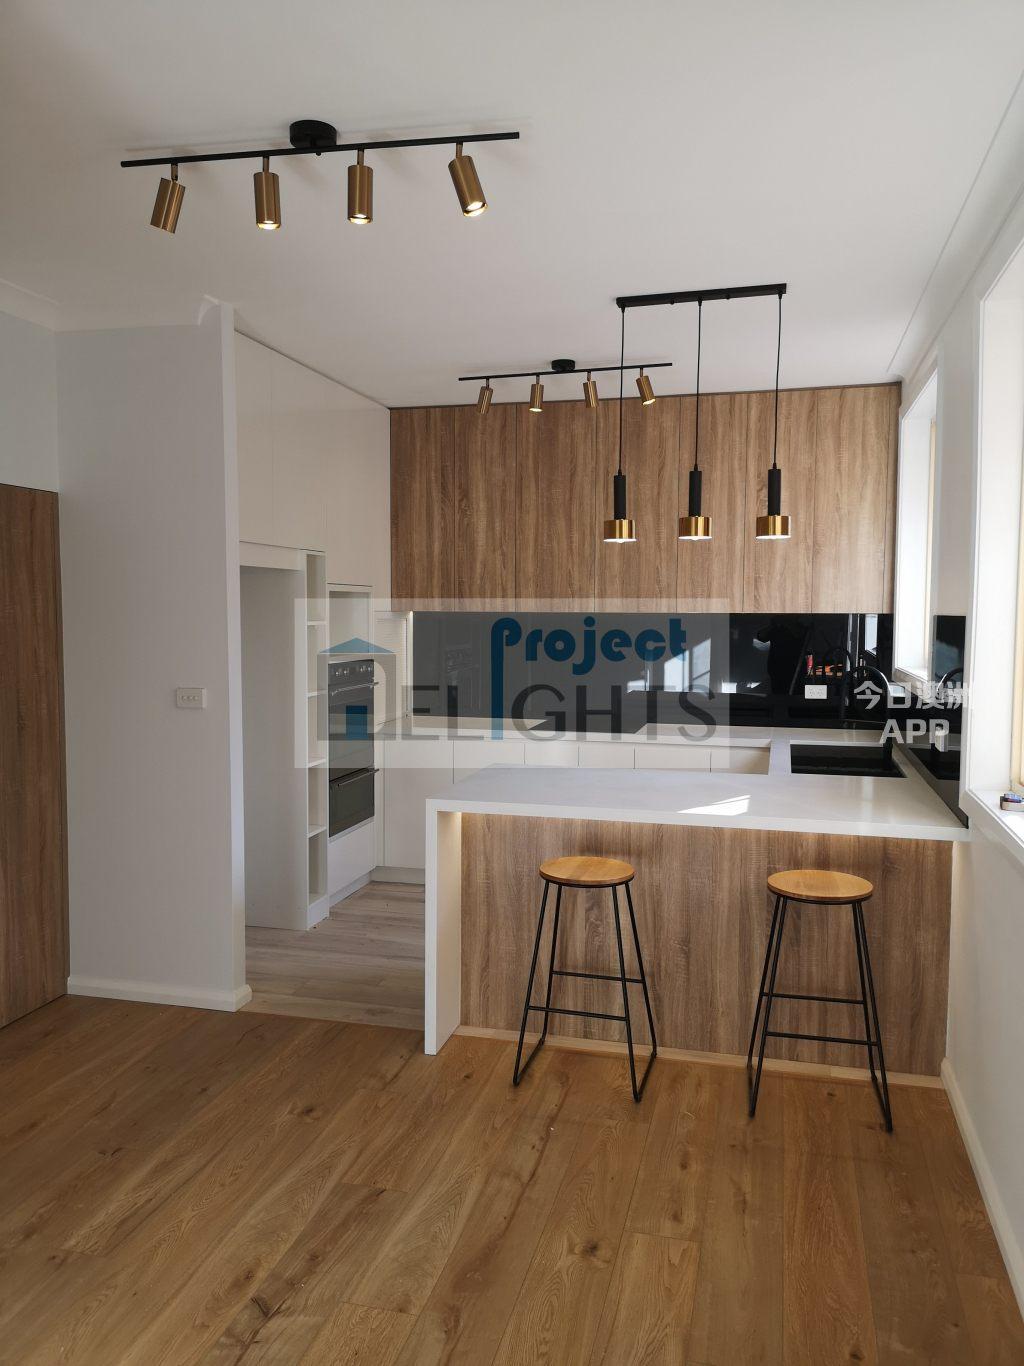 Delights Project 悉尼全屋裝修專業公司 房屋翻新